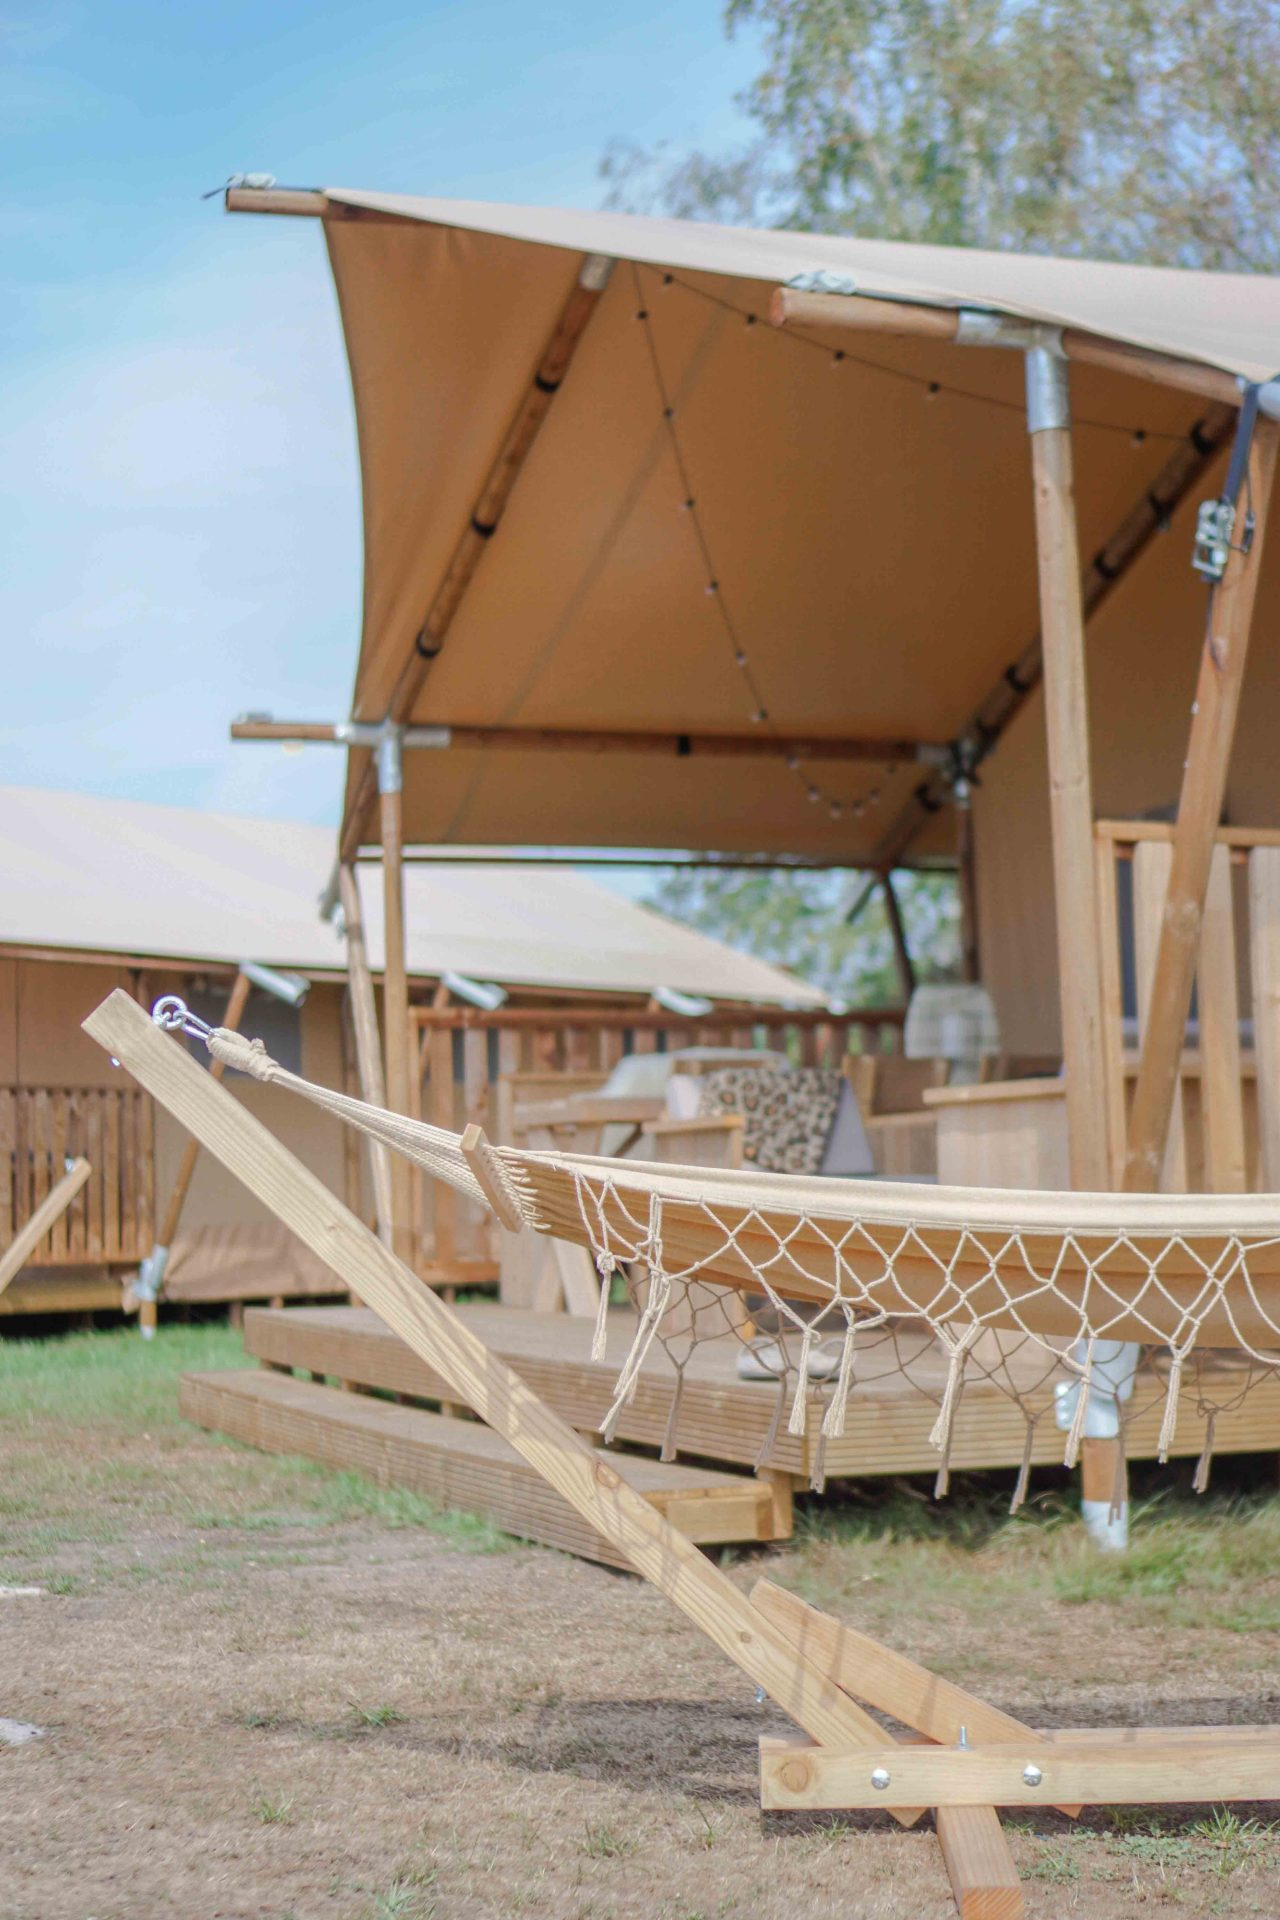 kamperen in stijl glamping nederland